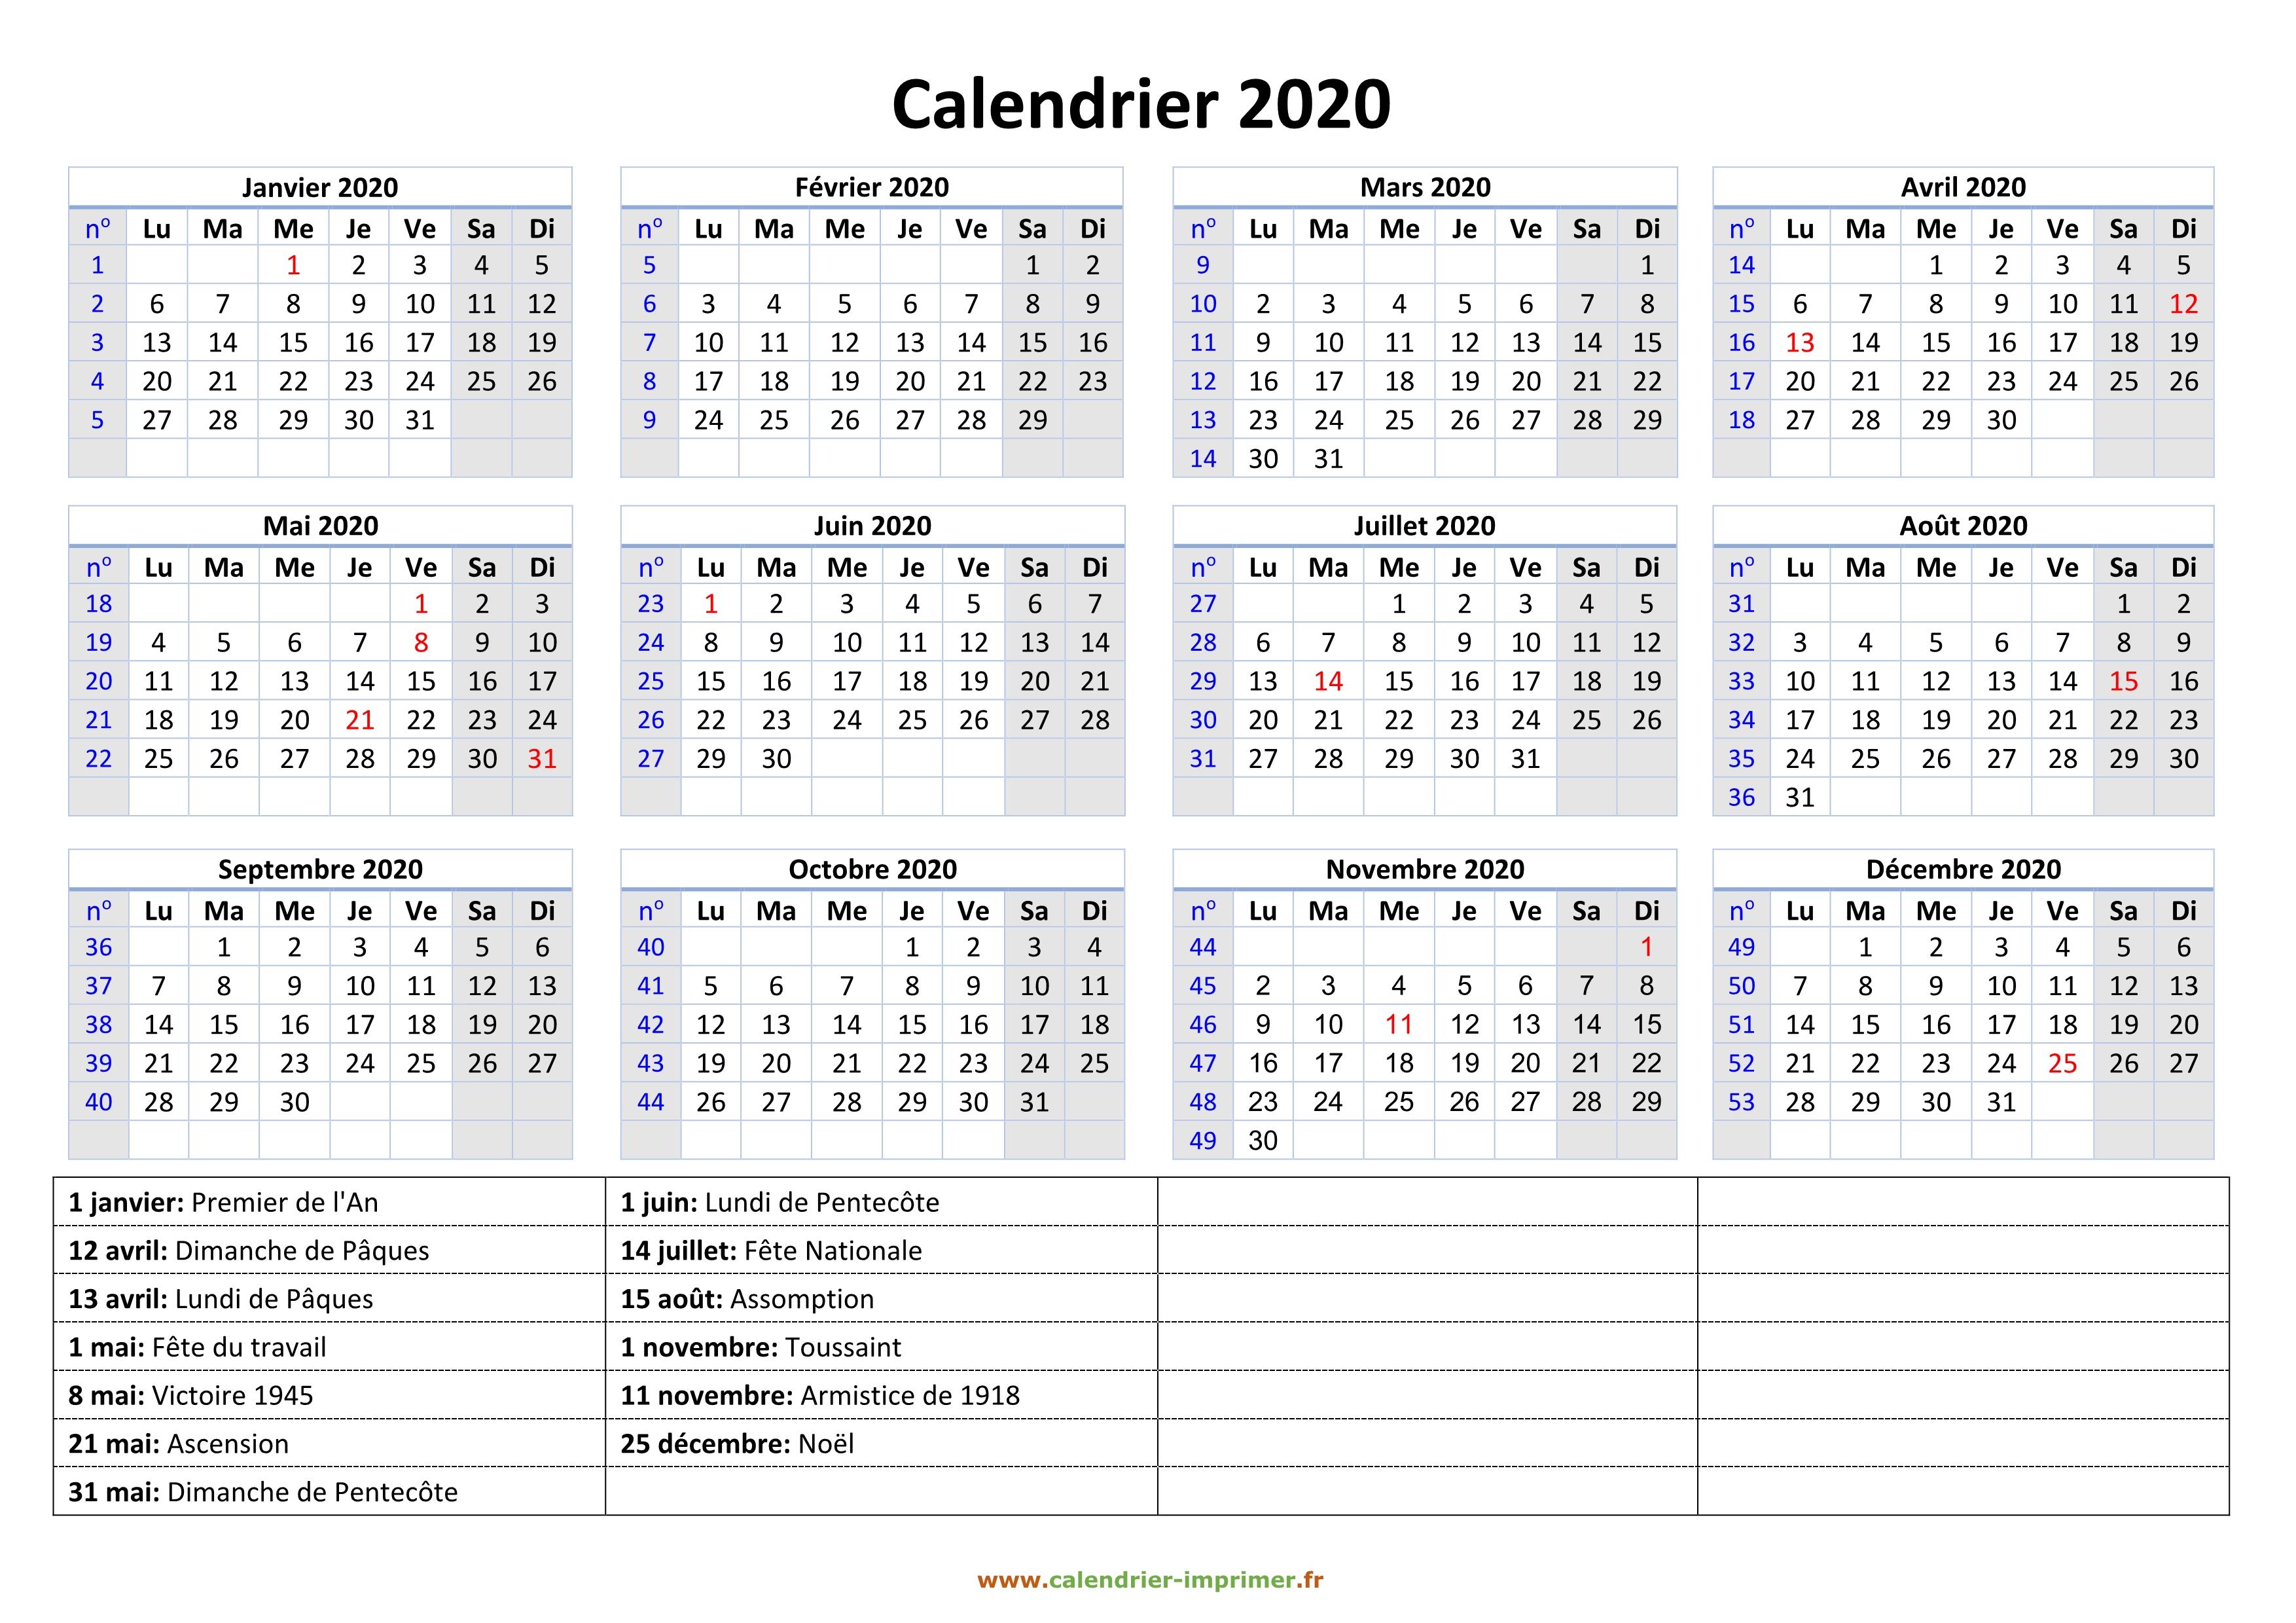 Calendrier 2020 Semaine Numerotees.Calendrier 2020 A Imprimer Gratuit